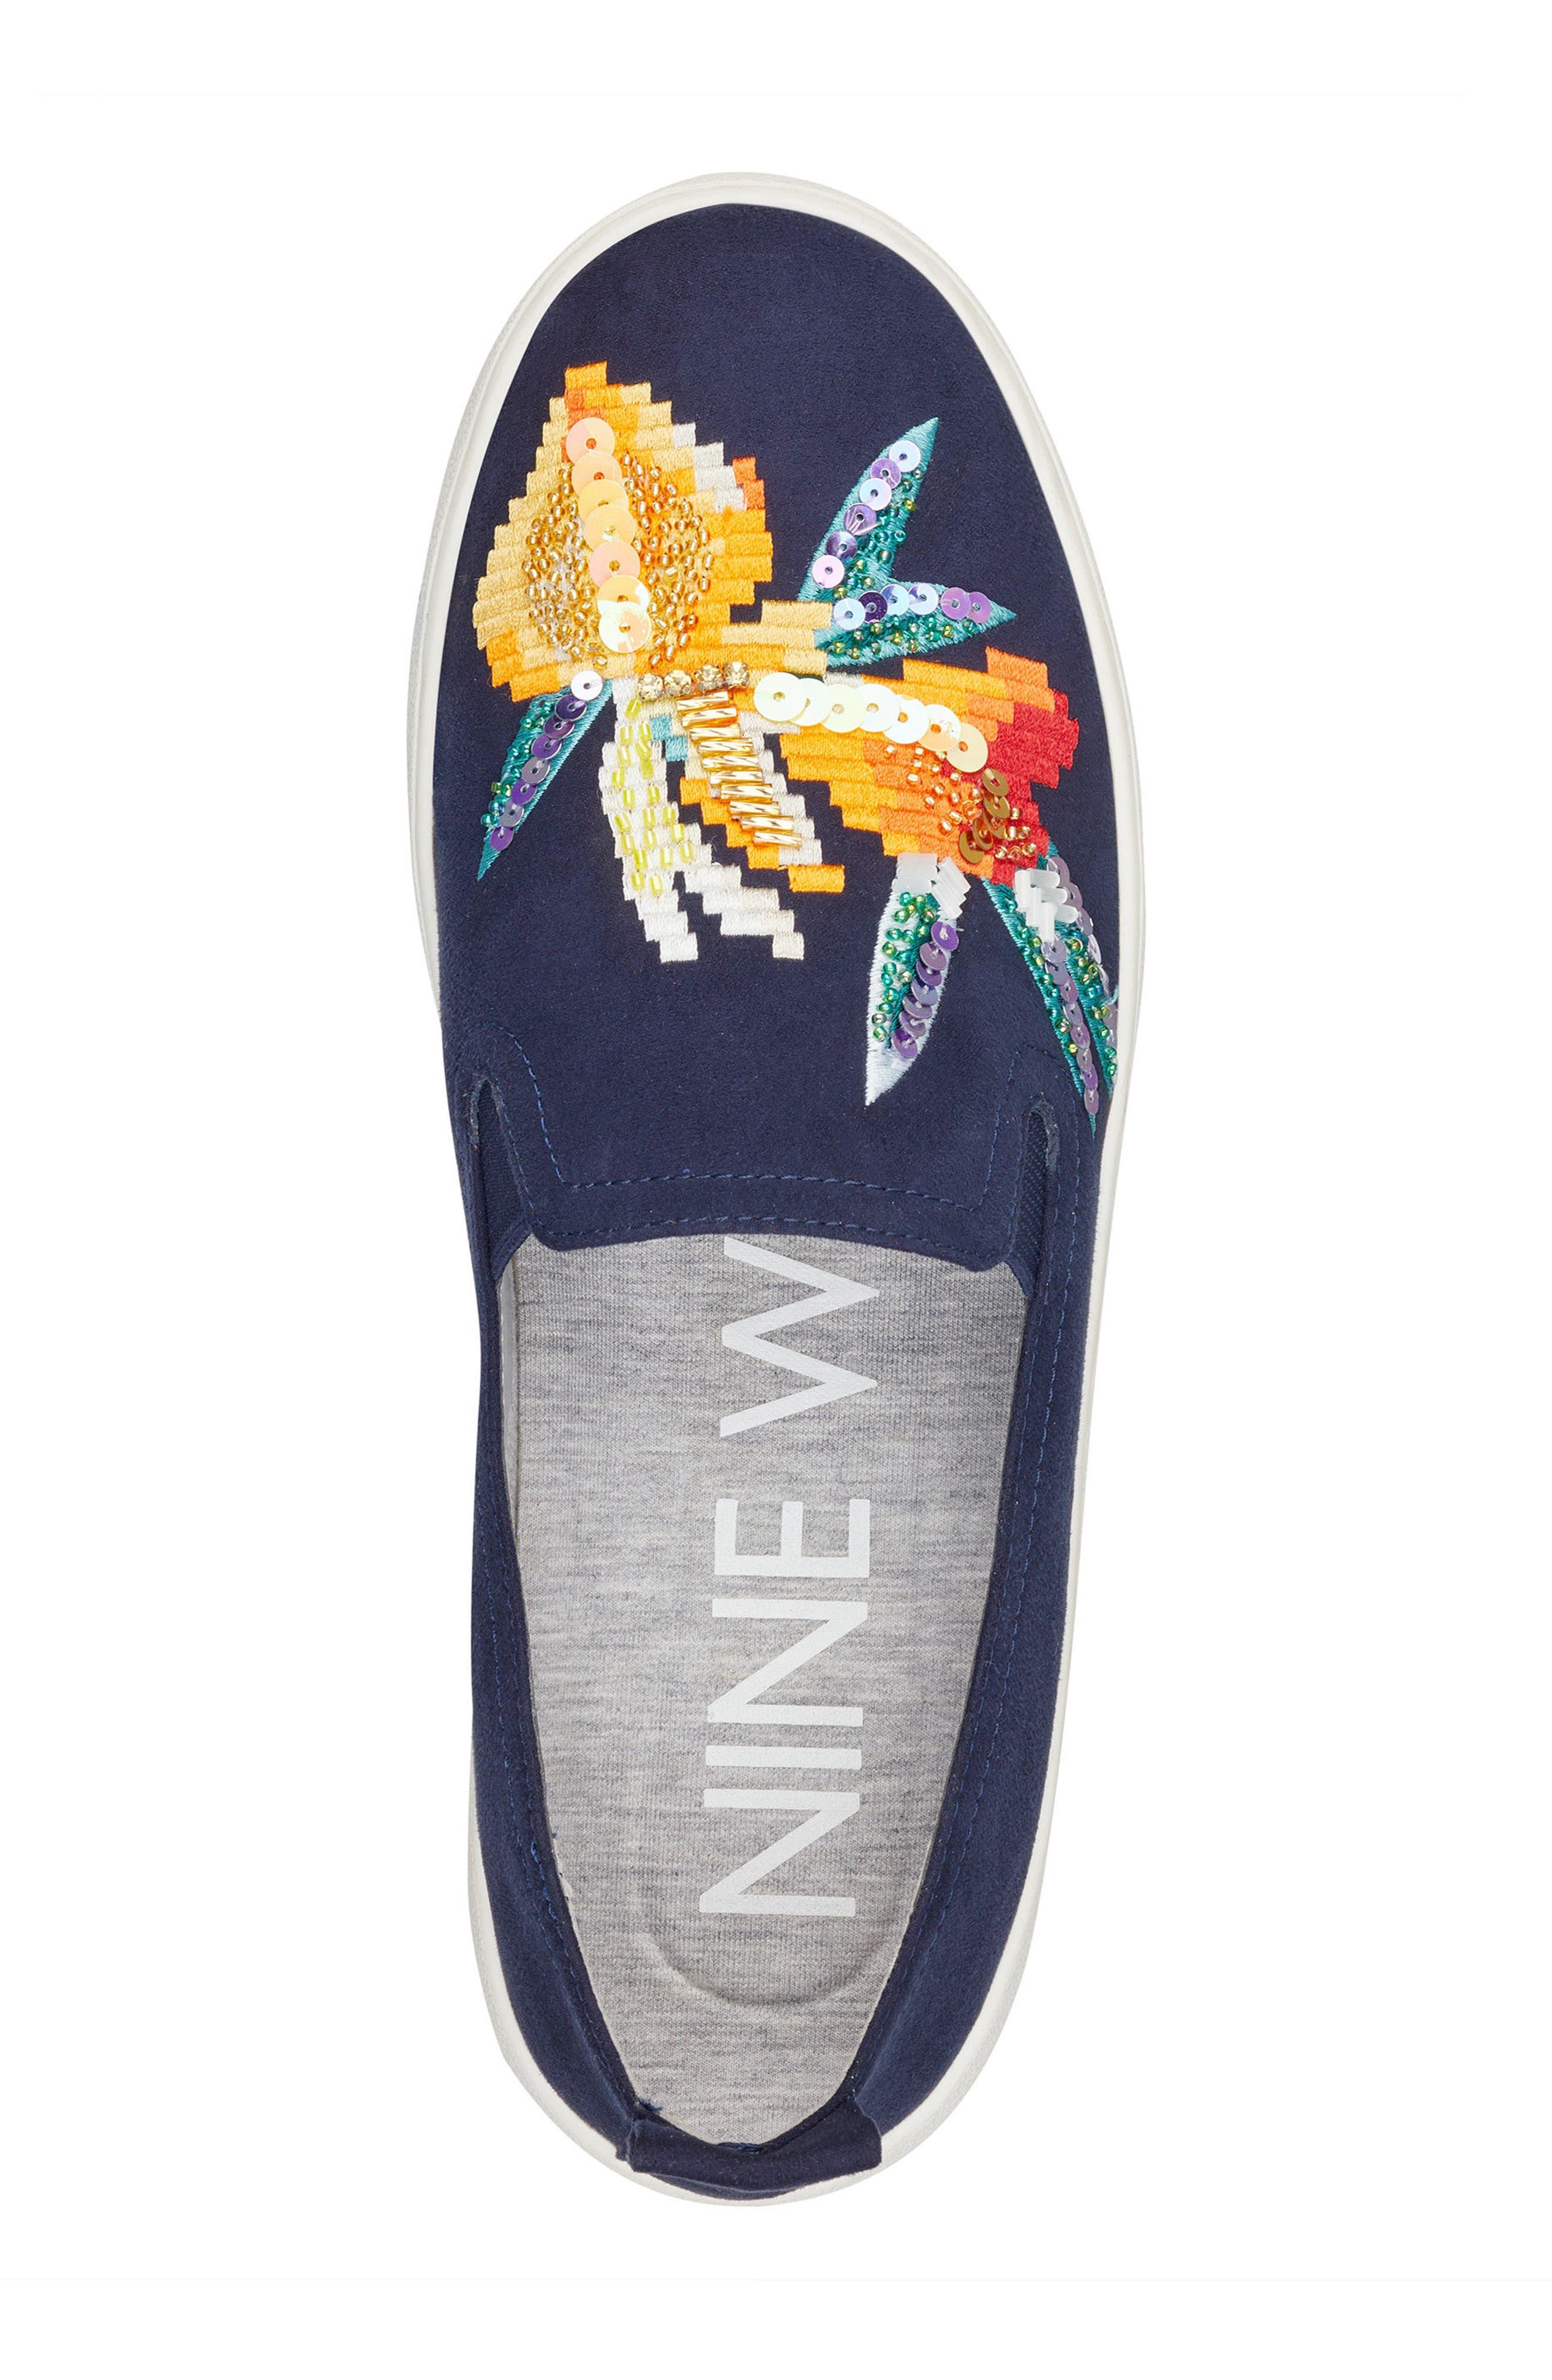 Playavista Slip-On Sneaker,                             Alternate thumbnail 5, color,                             Navy Suede